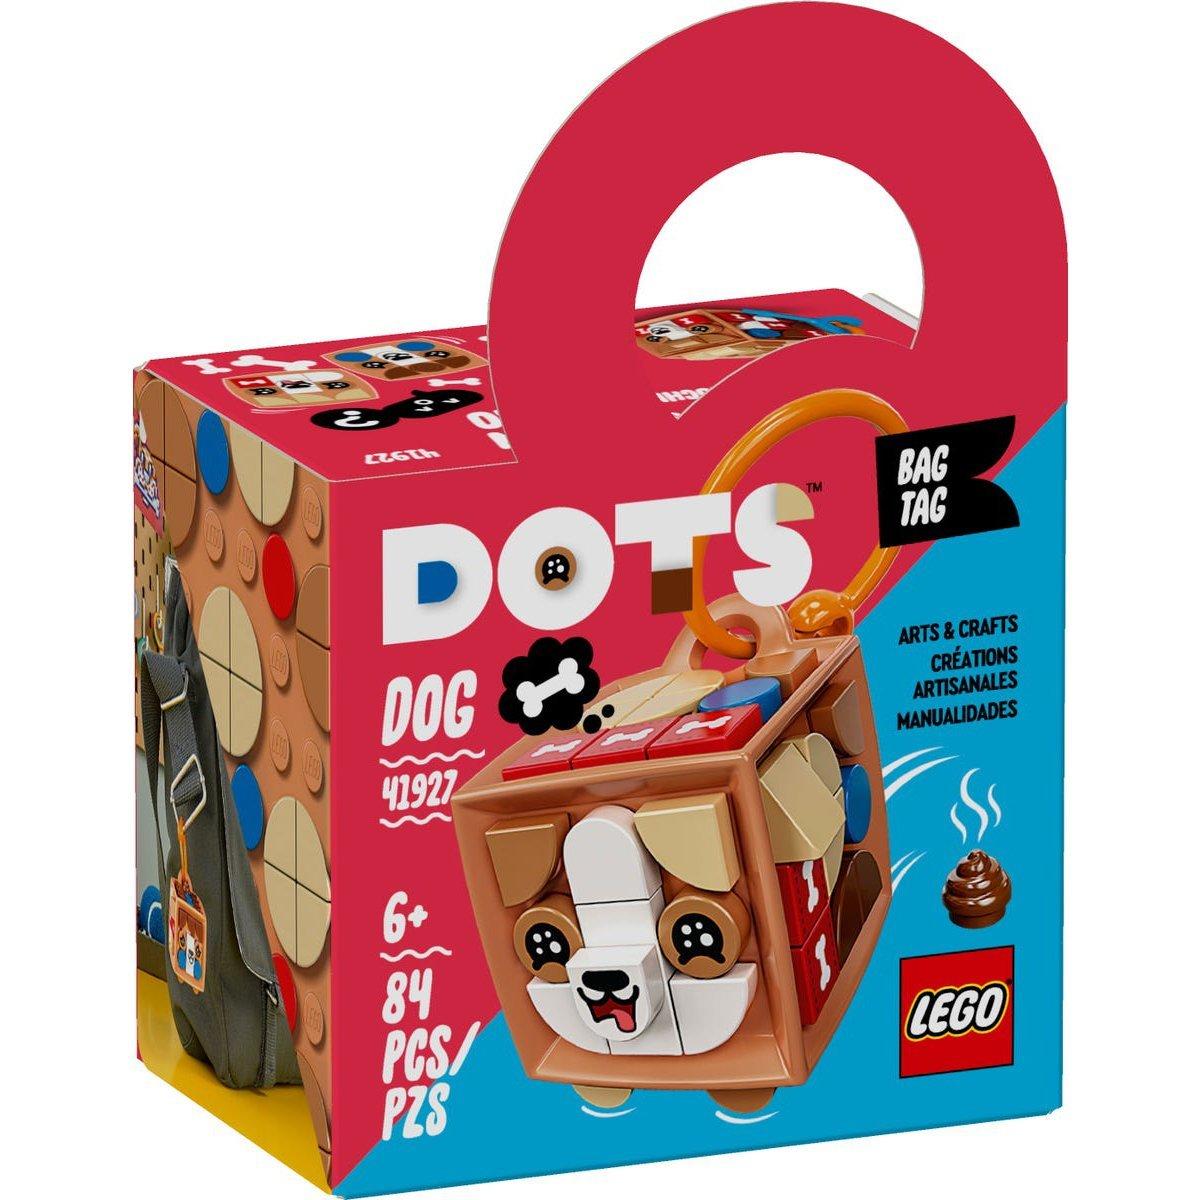 LEGO 樂高積木 DOTS 豆豆系列 41927 行李吊牌-狗狗